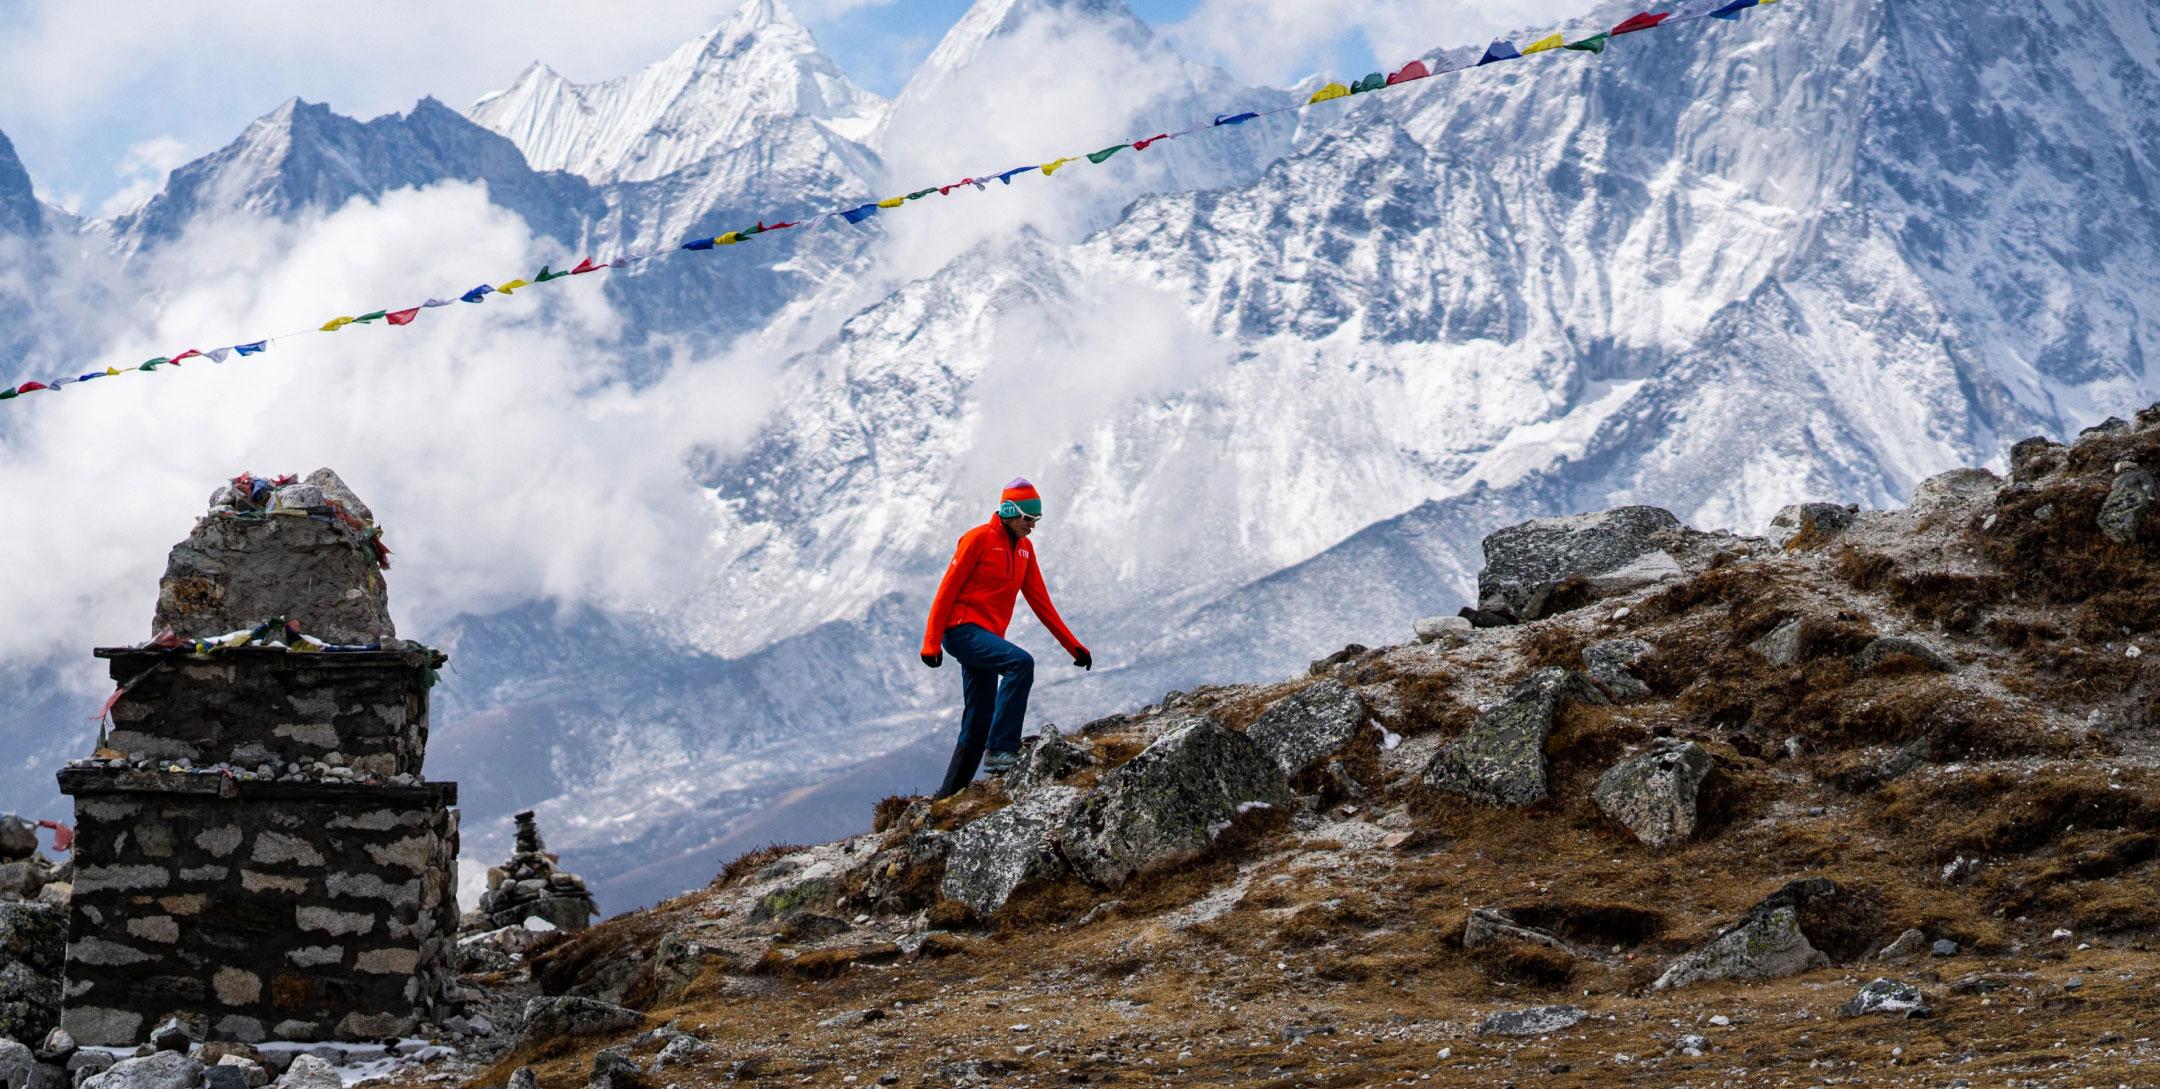 Climber treks up a beautiful mountainous path